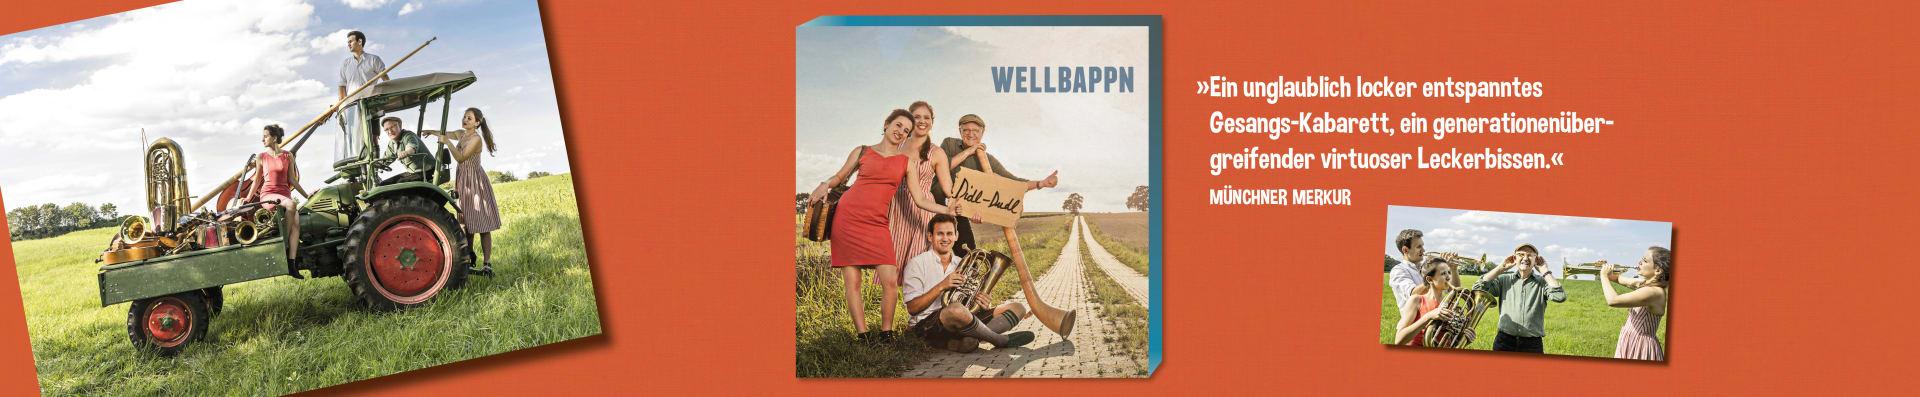 Wellbappn Didl-Dudl